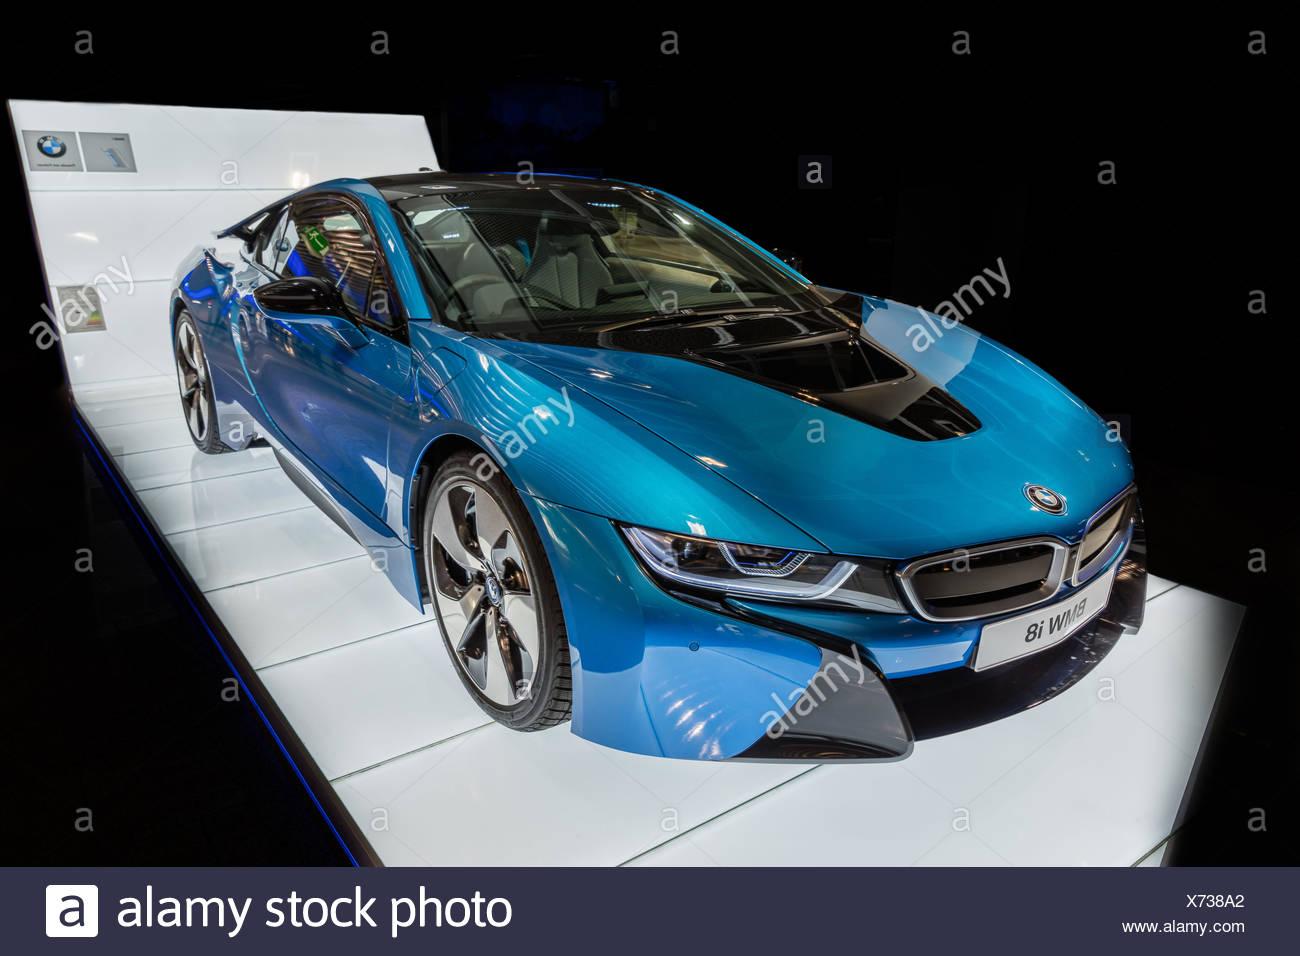 Bmw i8 plug stock photos bmw i8 plug stock images alamy for Hybrid car electric motor